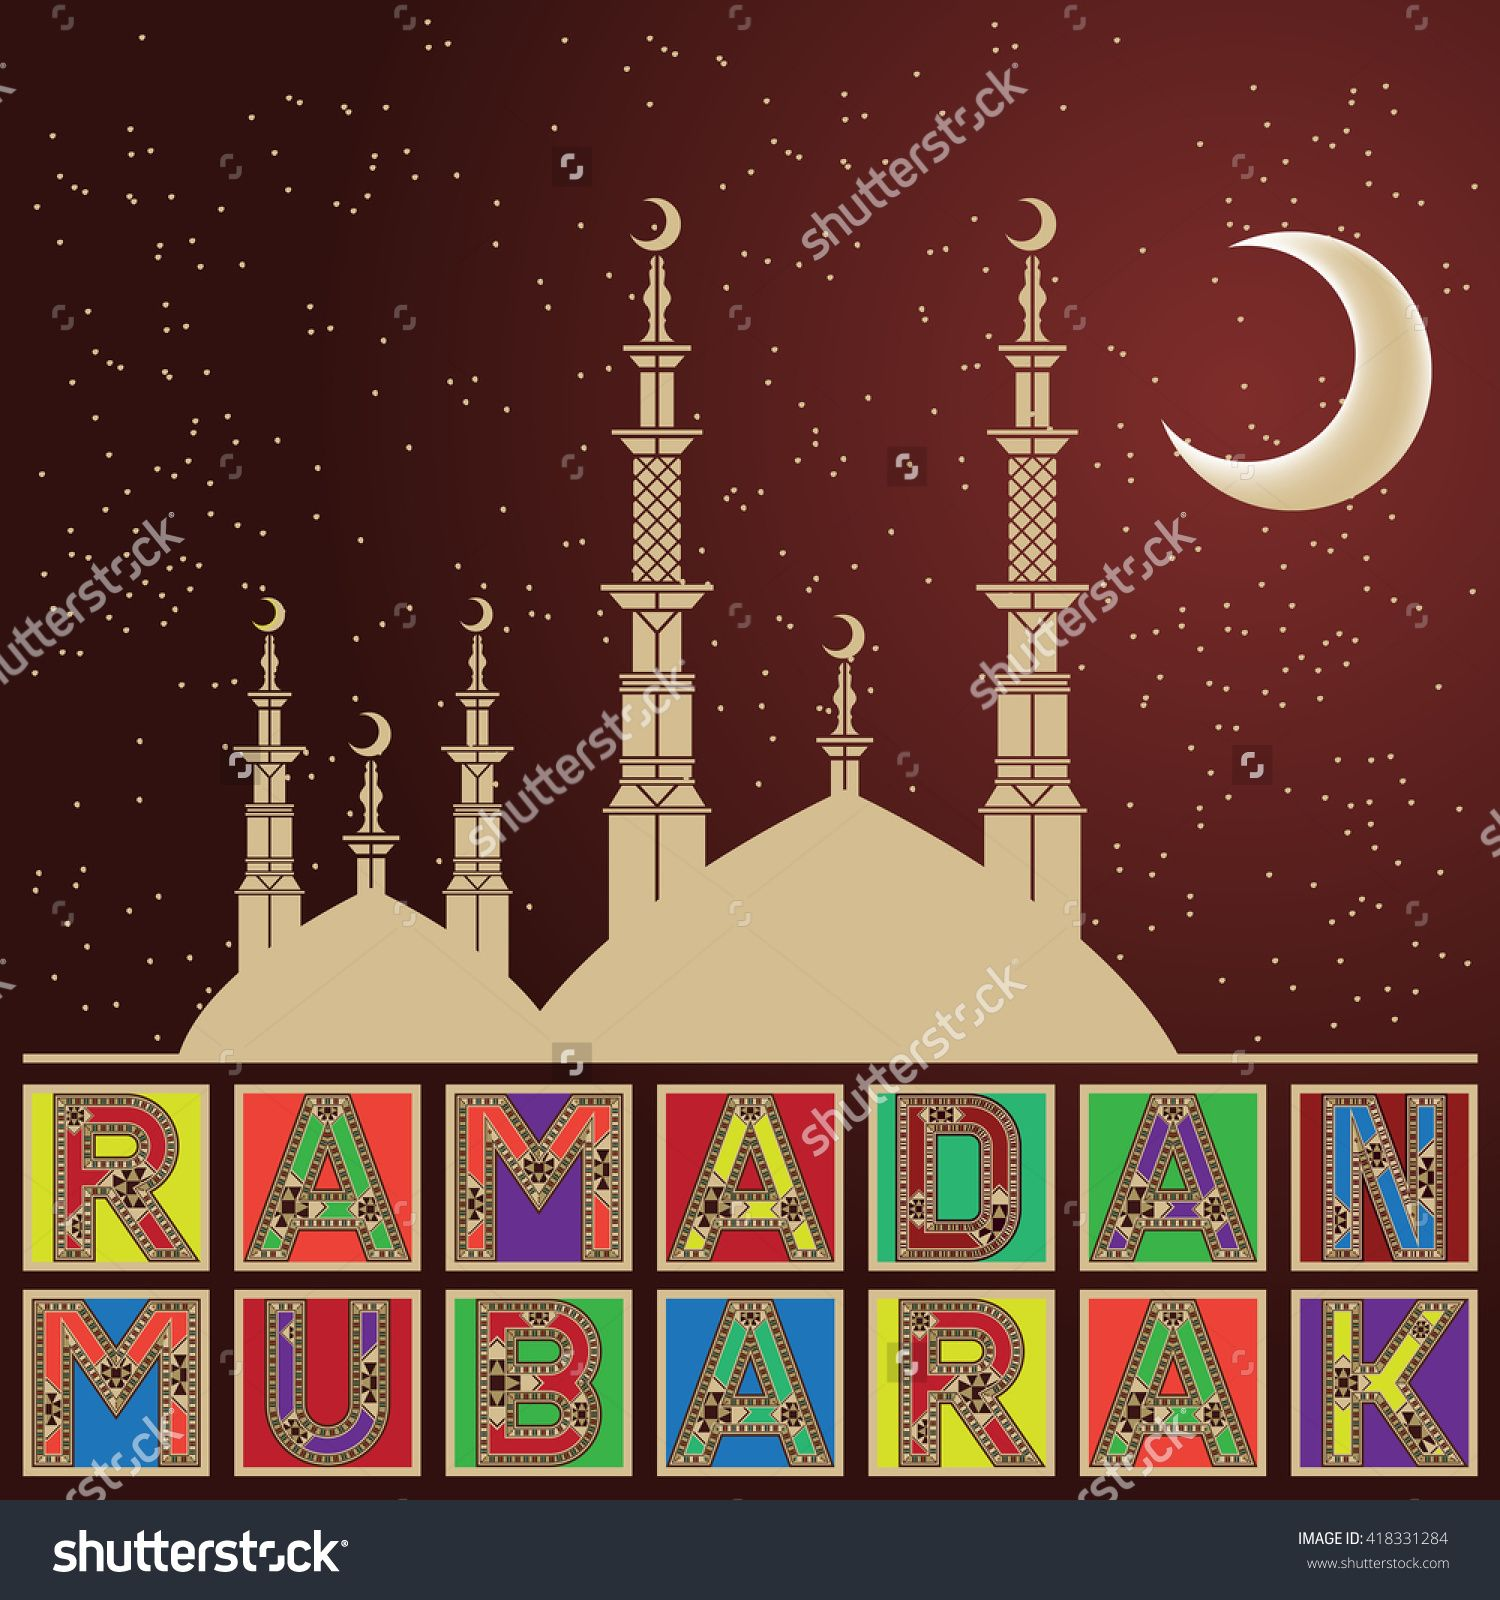 Ramadan Mubarak Greeting Card Image Id418331284 Copyright Craitza